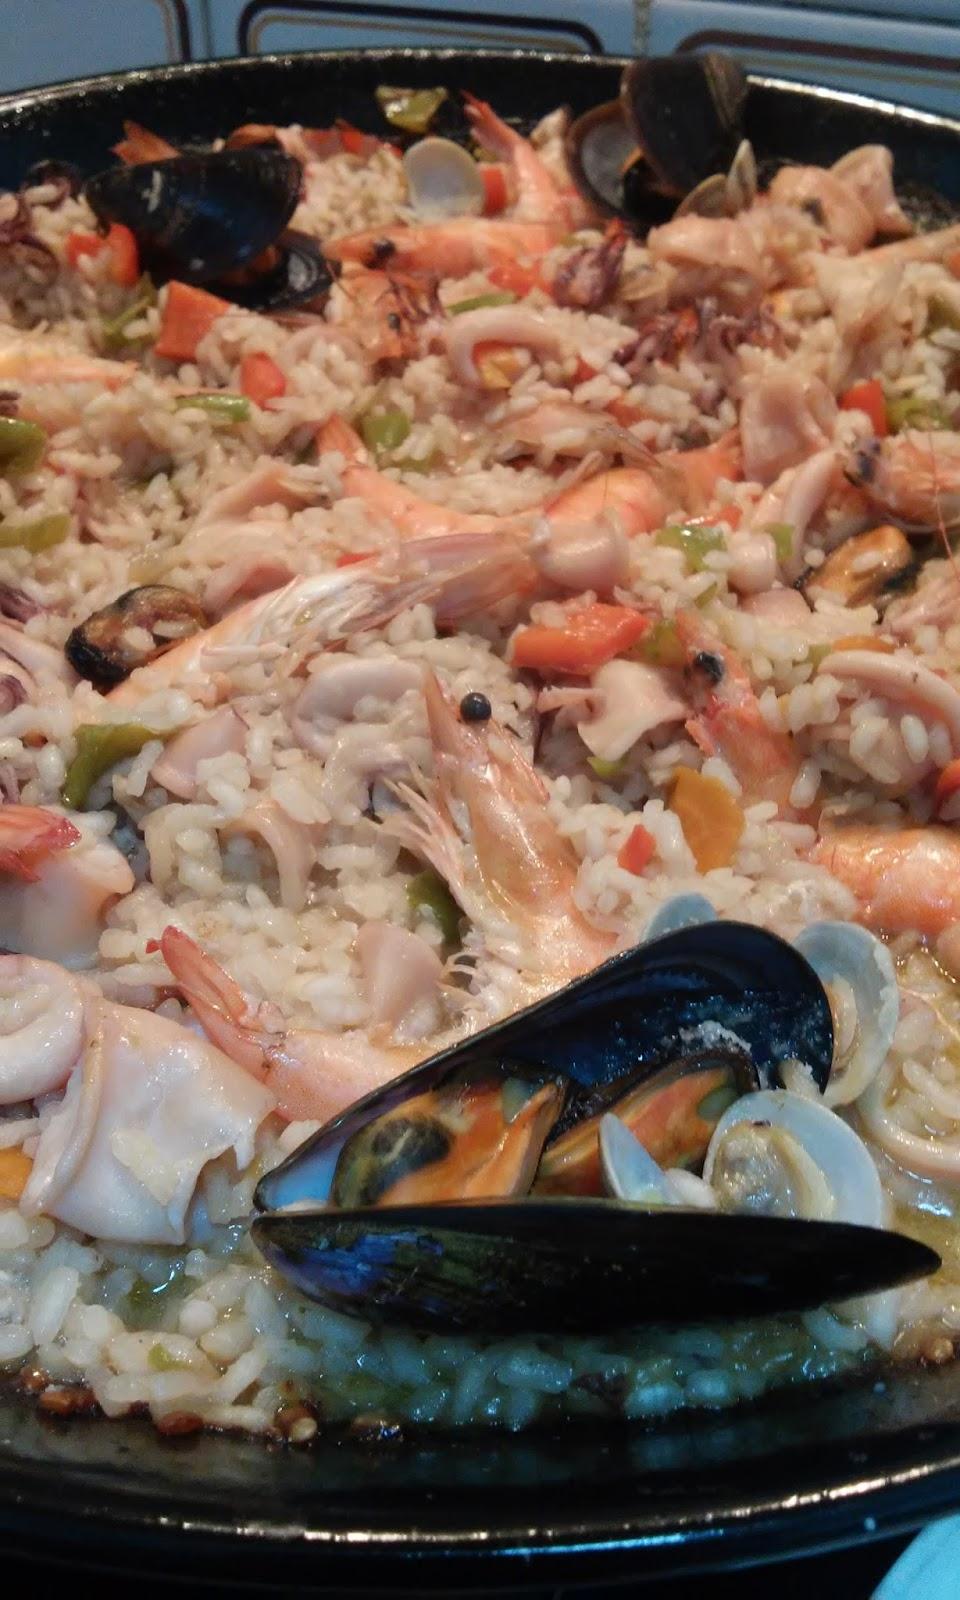 Cocinando con mandil paella de pescado - Paella de pescado ...